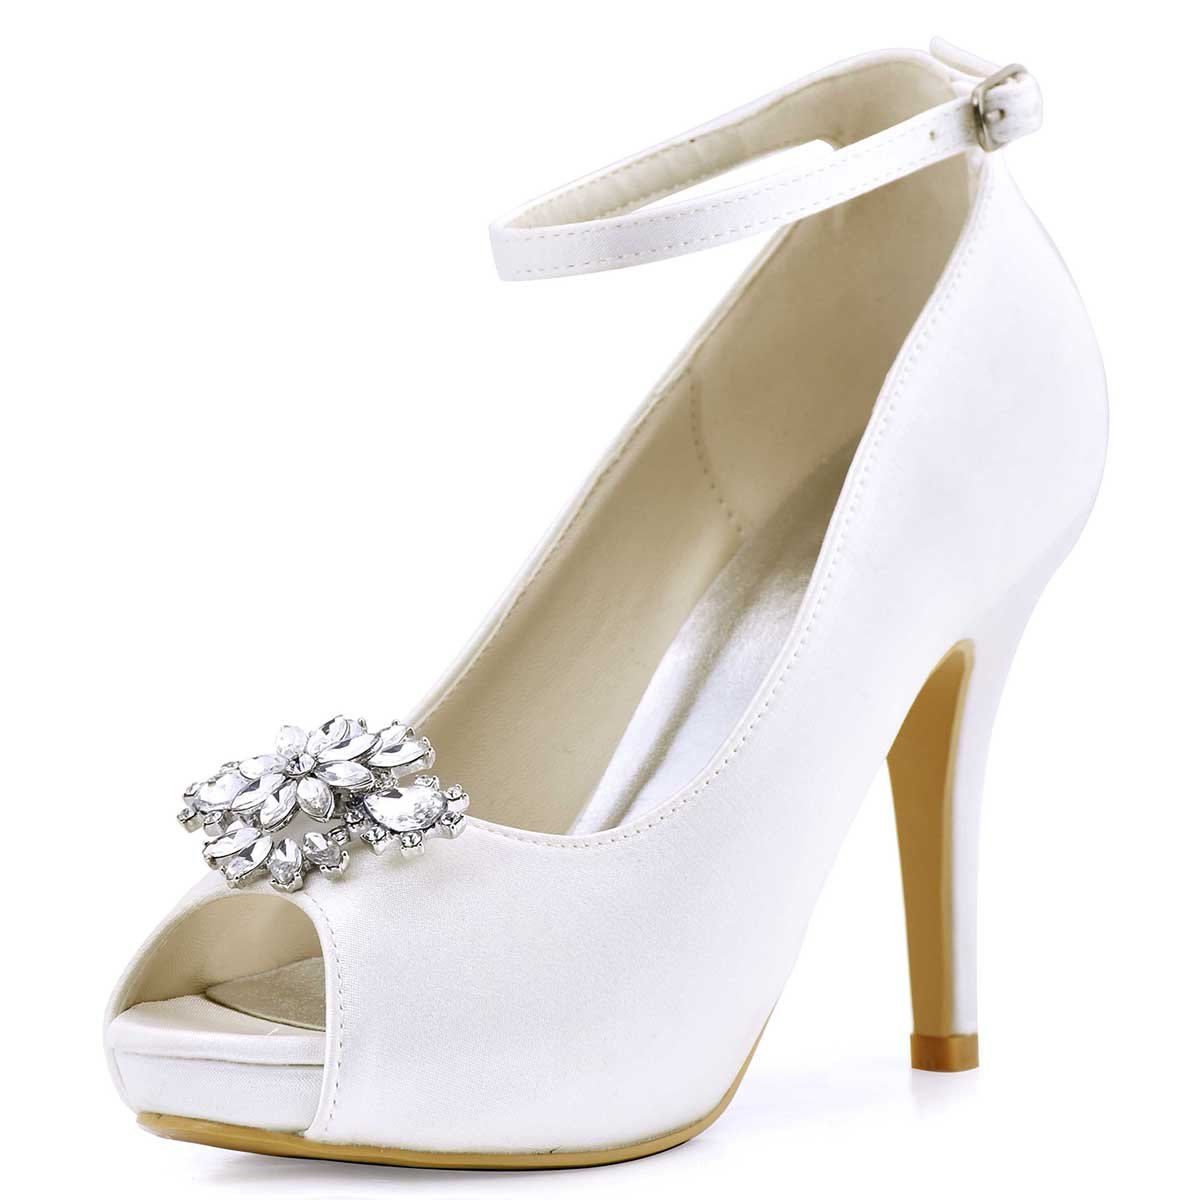 ElegantPark AK Wedding Dress Clutch Double Rhinestones Flowers Silver Shoe Clips 2 Pcs by ElegantPark (Image #3)